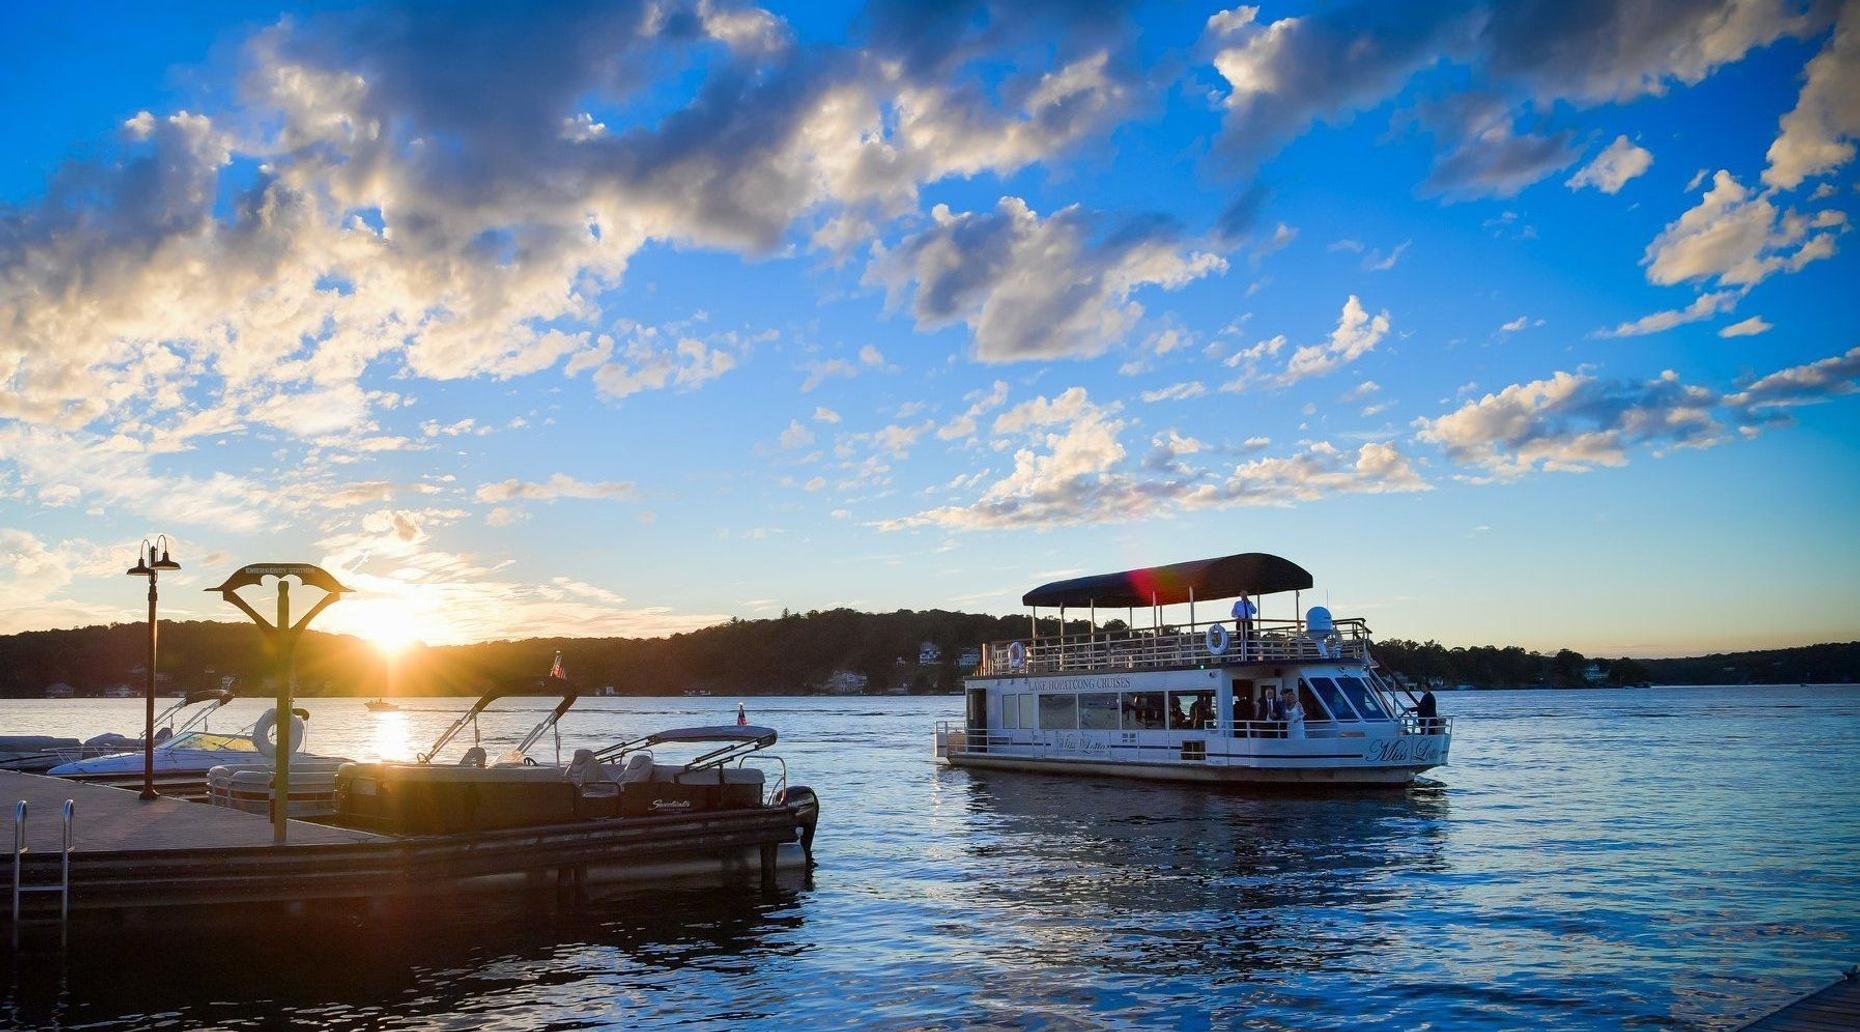 Lake Hopatcong Sunset Dinner Cruise